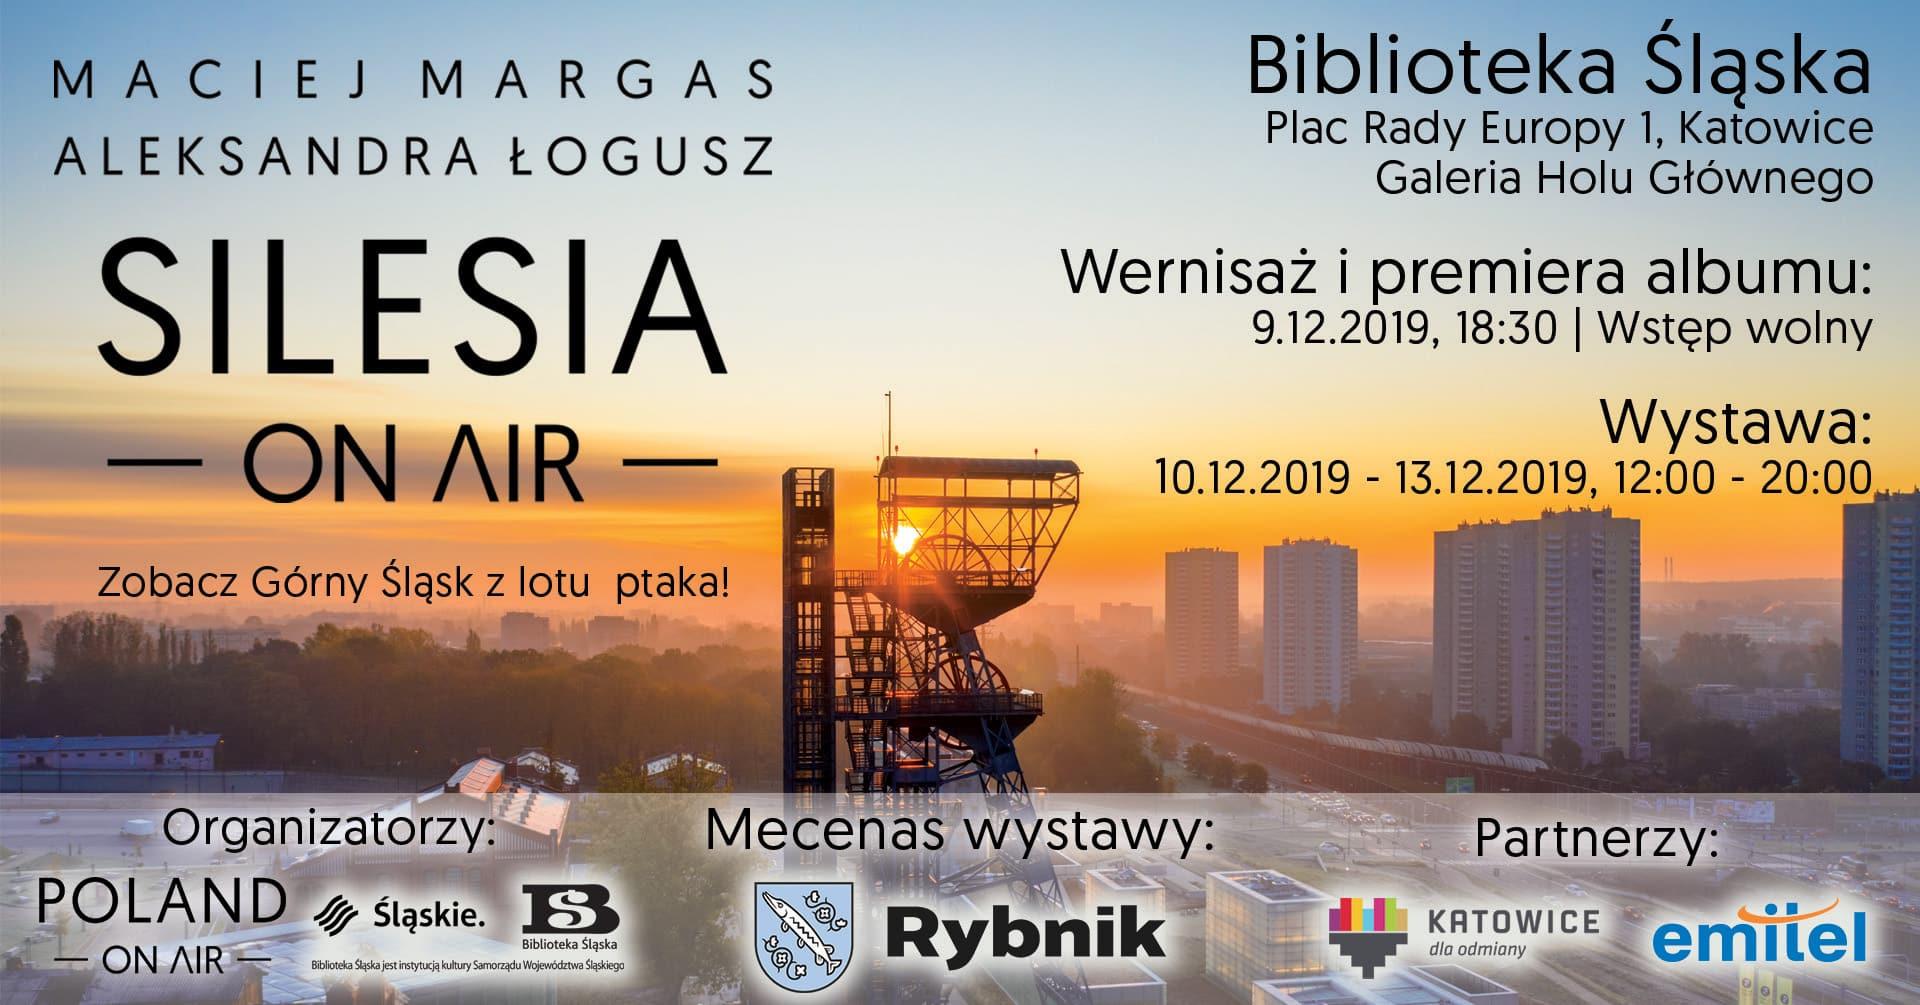 SILESIA ON AIR wystawa